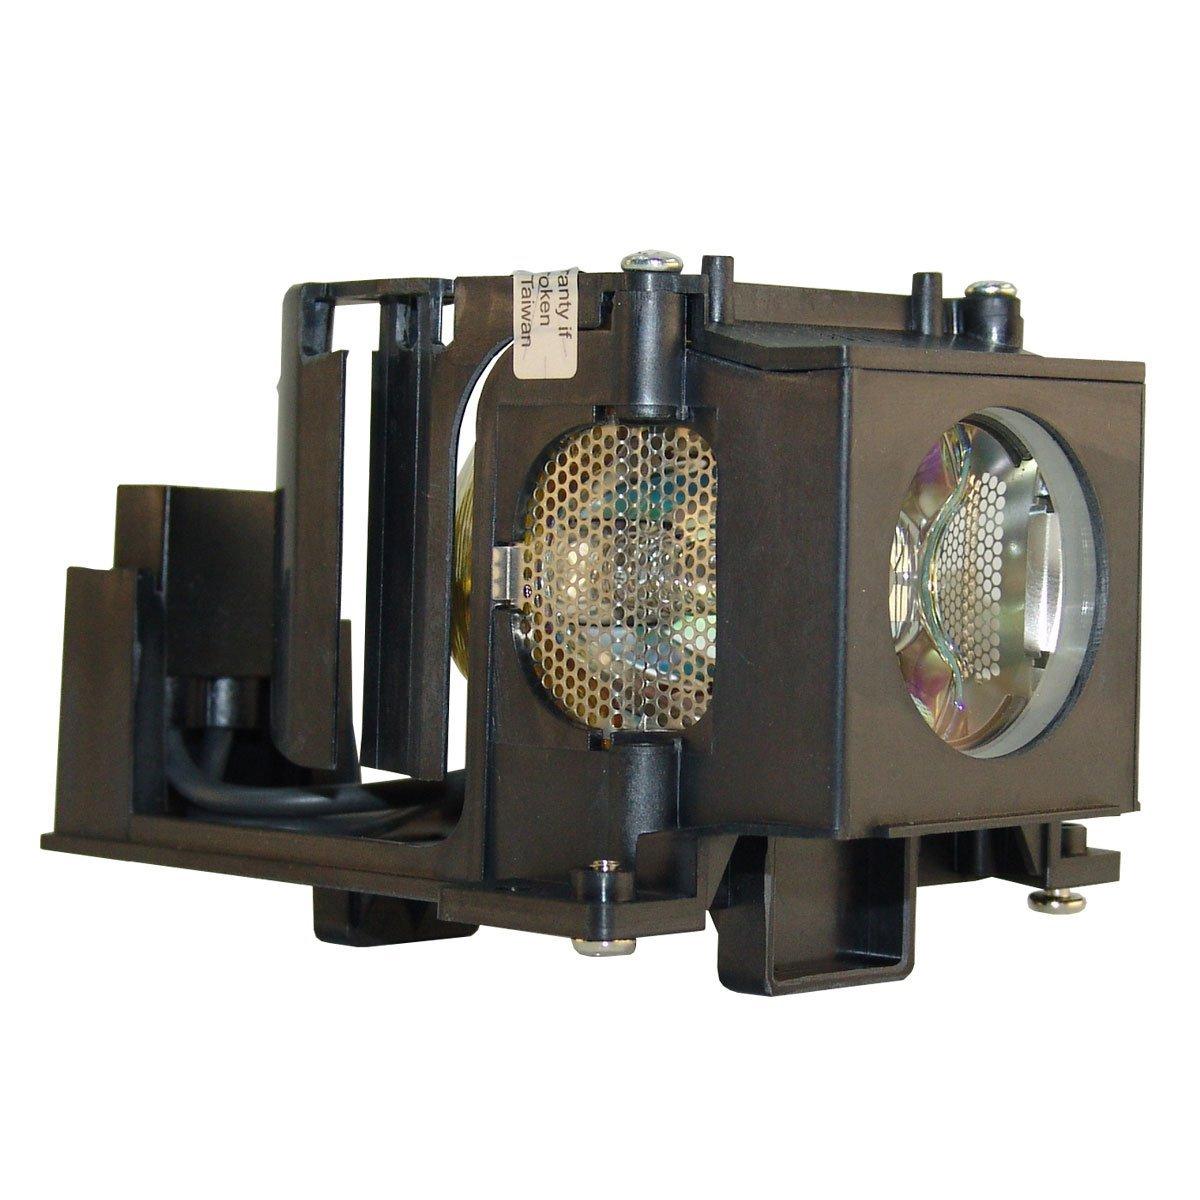 POA-LMP107 LMP107 610-330-4564 para SANYO PLC-XW55A PLC-XE32 PLC-XW55 PLC-XW56 XW56 PLC-XW50 bombilla de proyector con carcasa